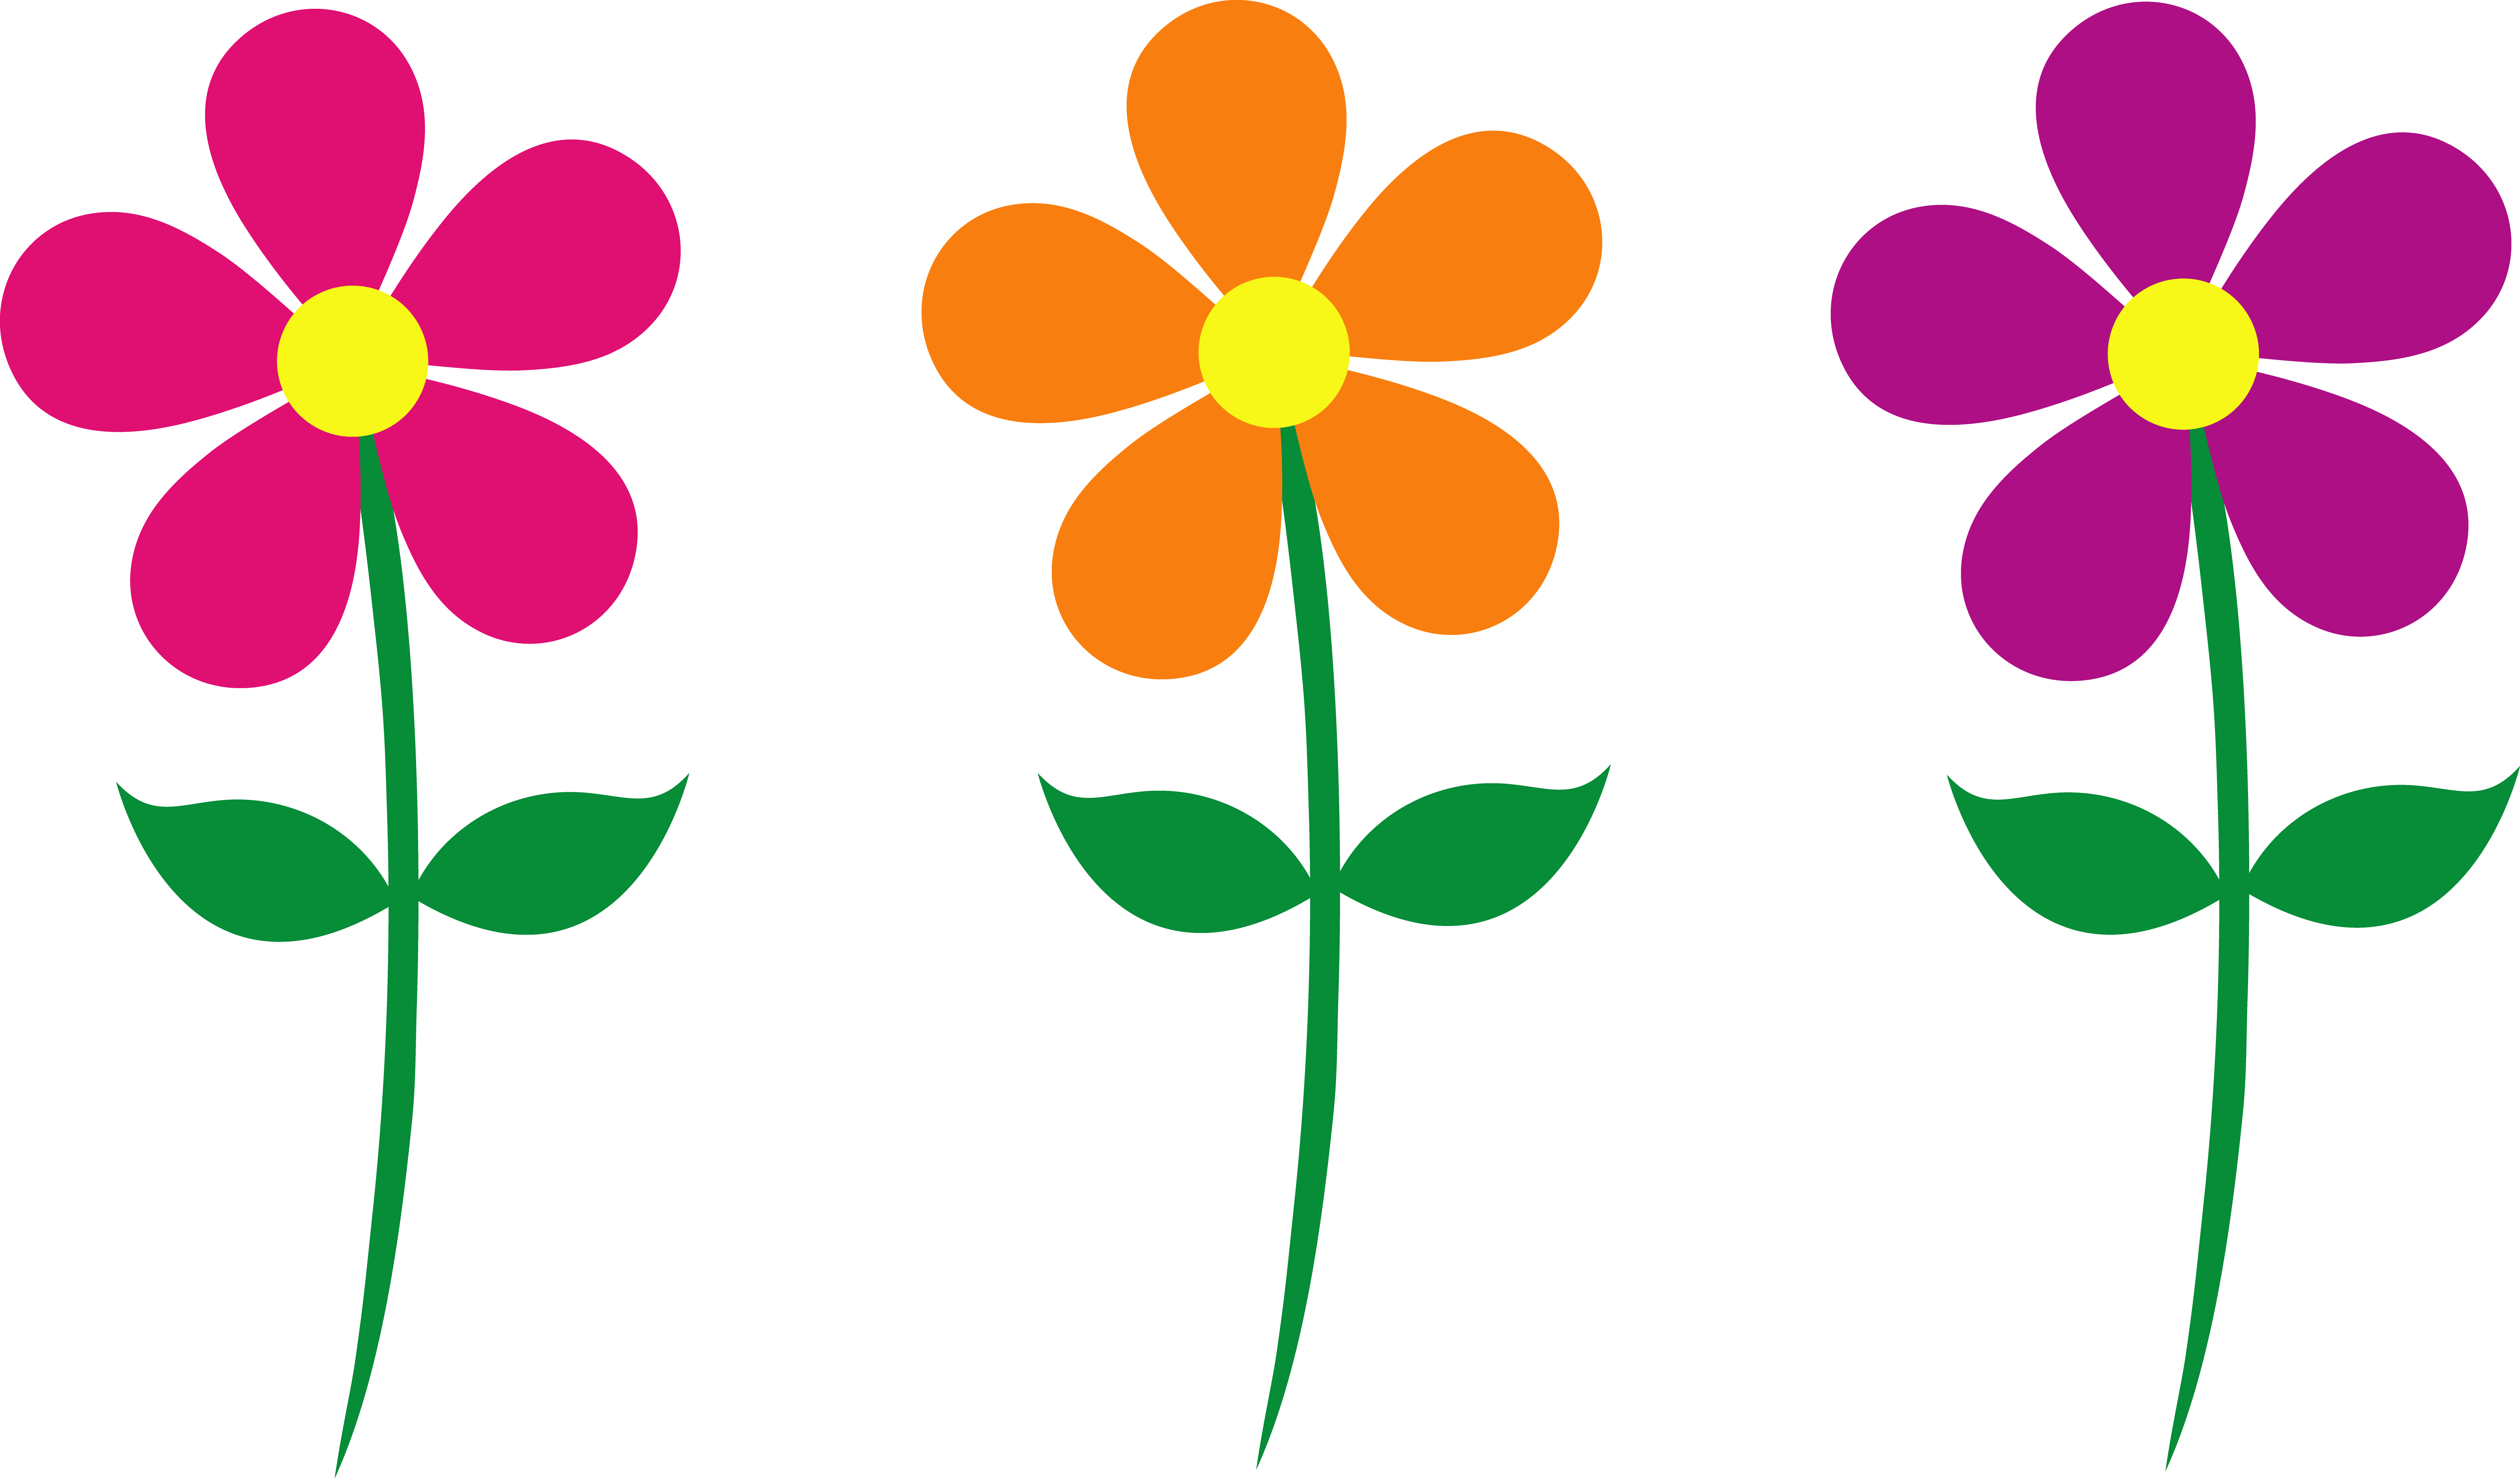 Daisy Flower Clip Art Black And White Fr-Daisy flower clip art black and white free 2-10